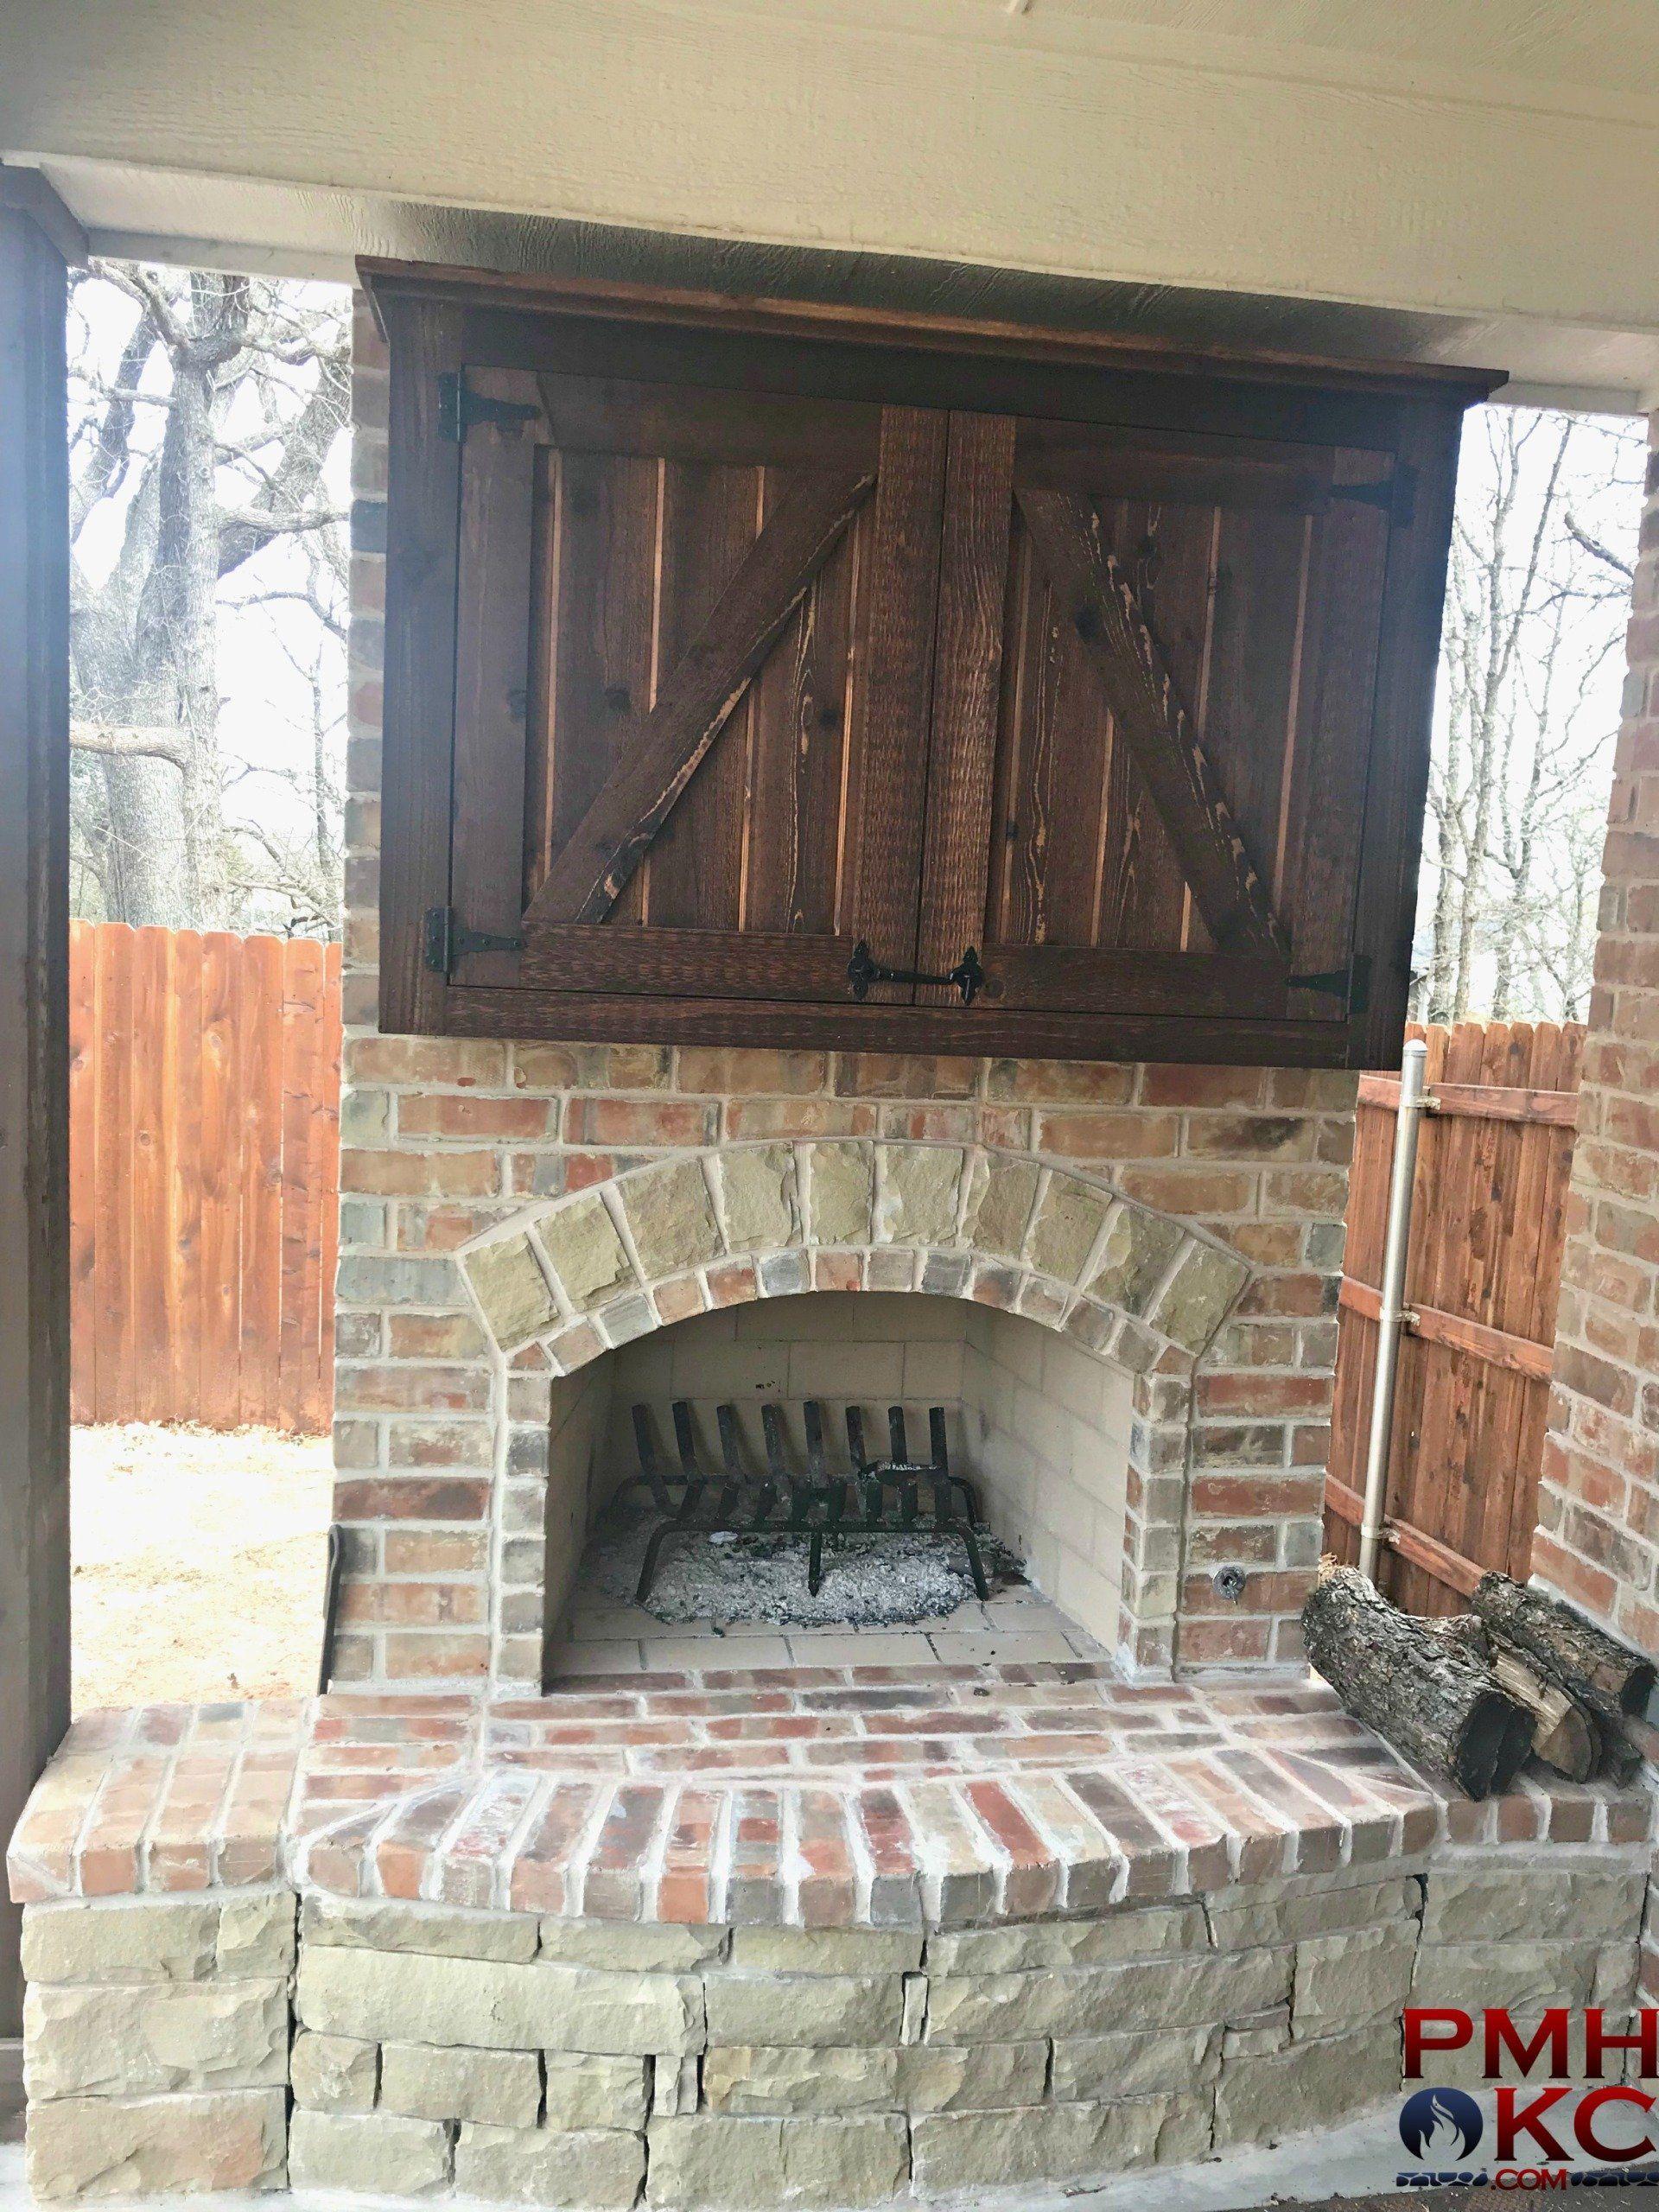 Outdoor Fireplaces Fireplace Custom Fireplace Brick Fireplace